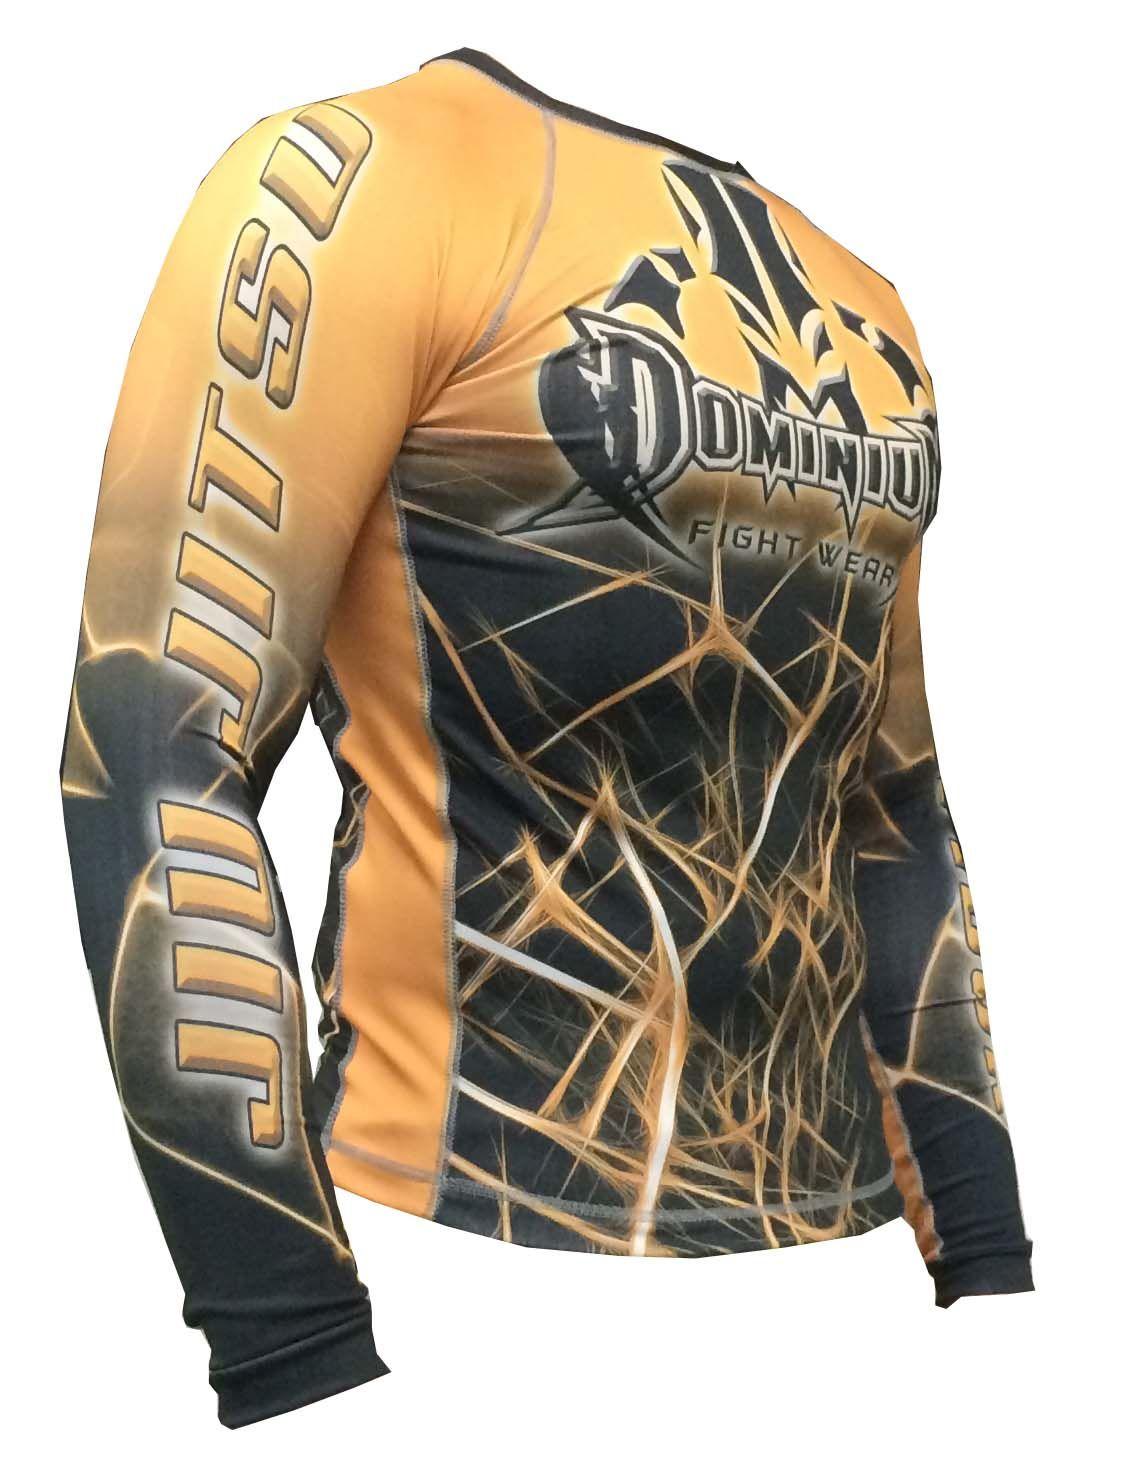 Camisa Rash Guard - Manga Longa - Preto/Laranja - Jiu Jitsu Competidor - 2797LA- Dominium